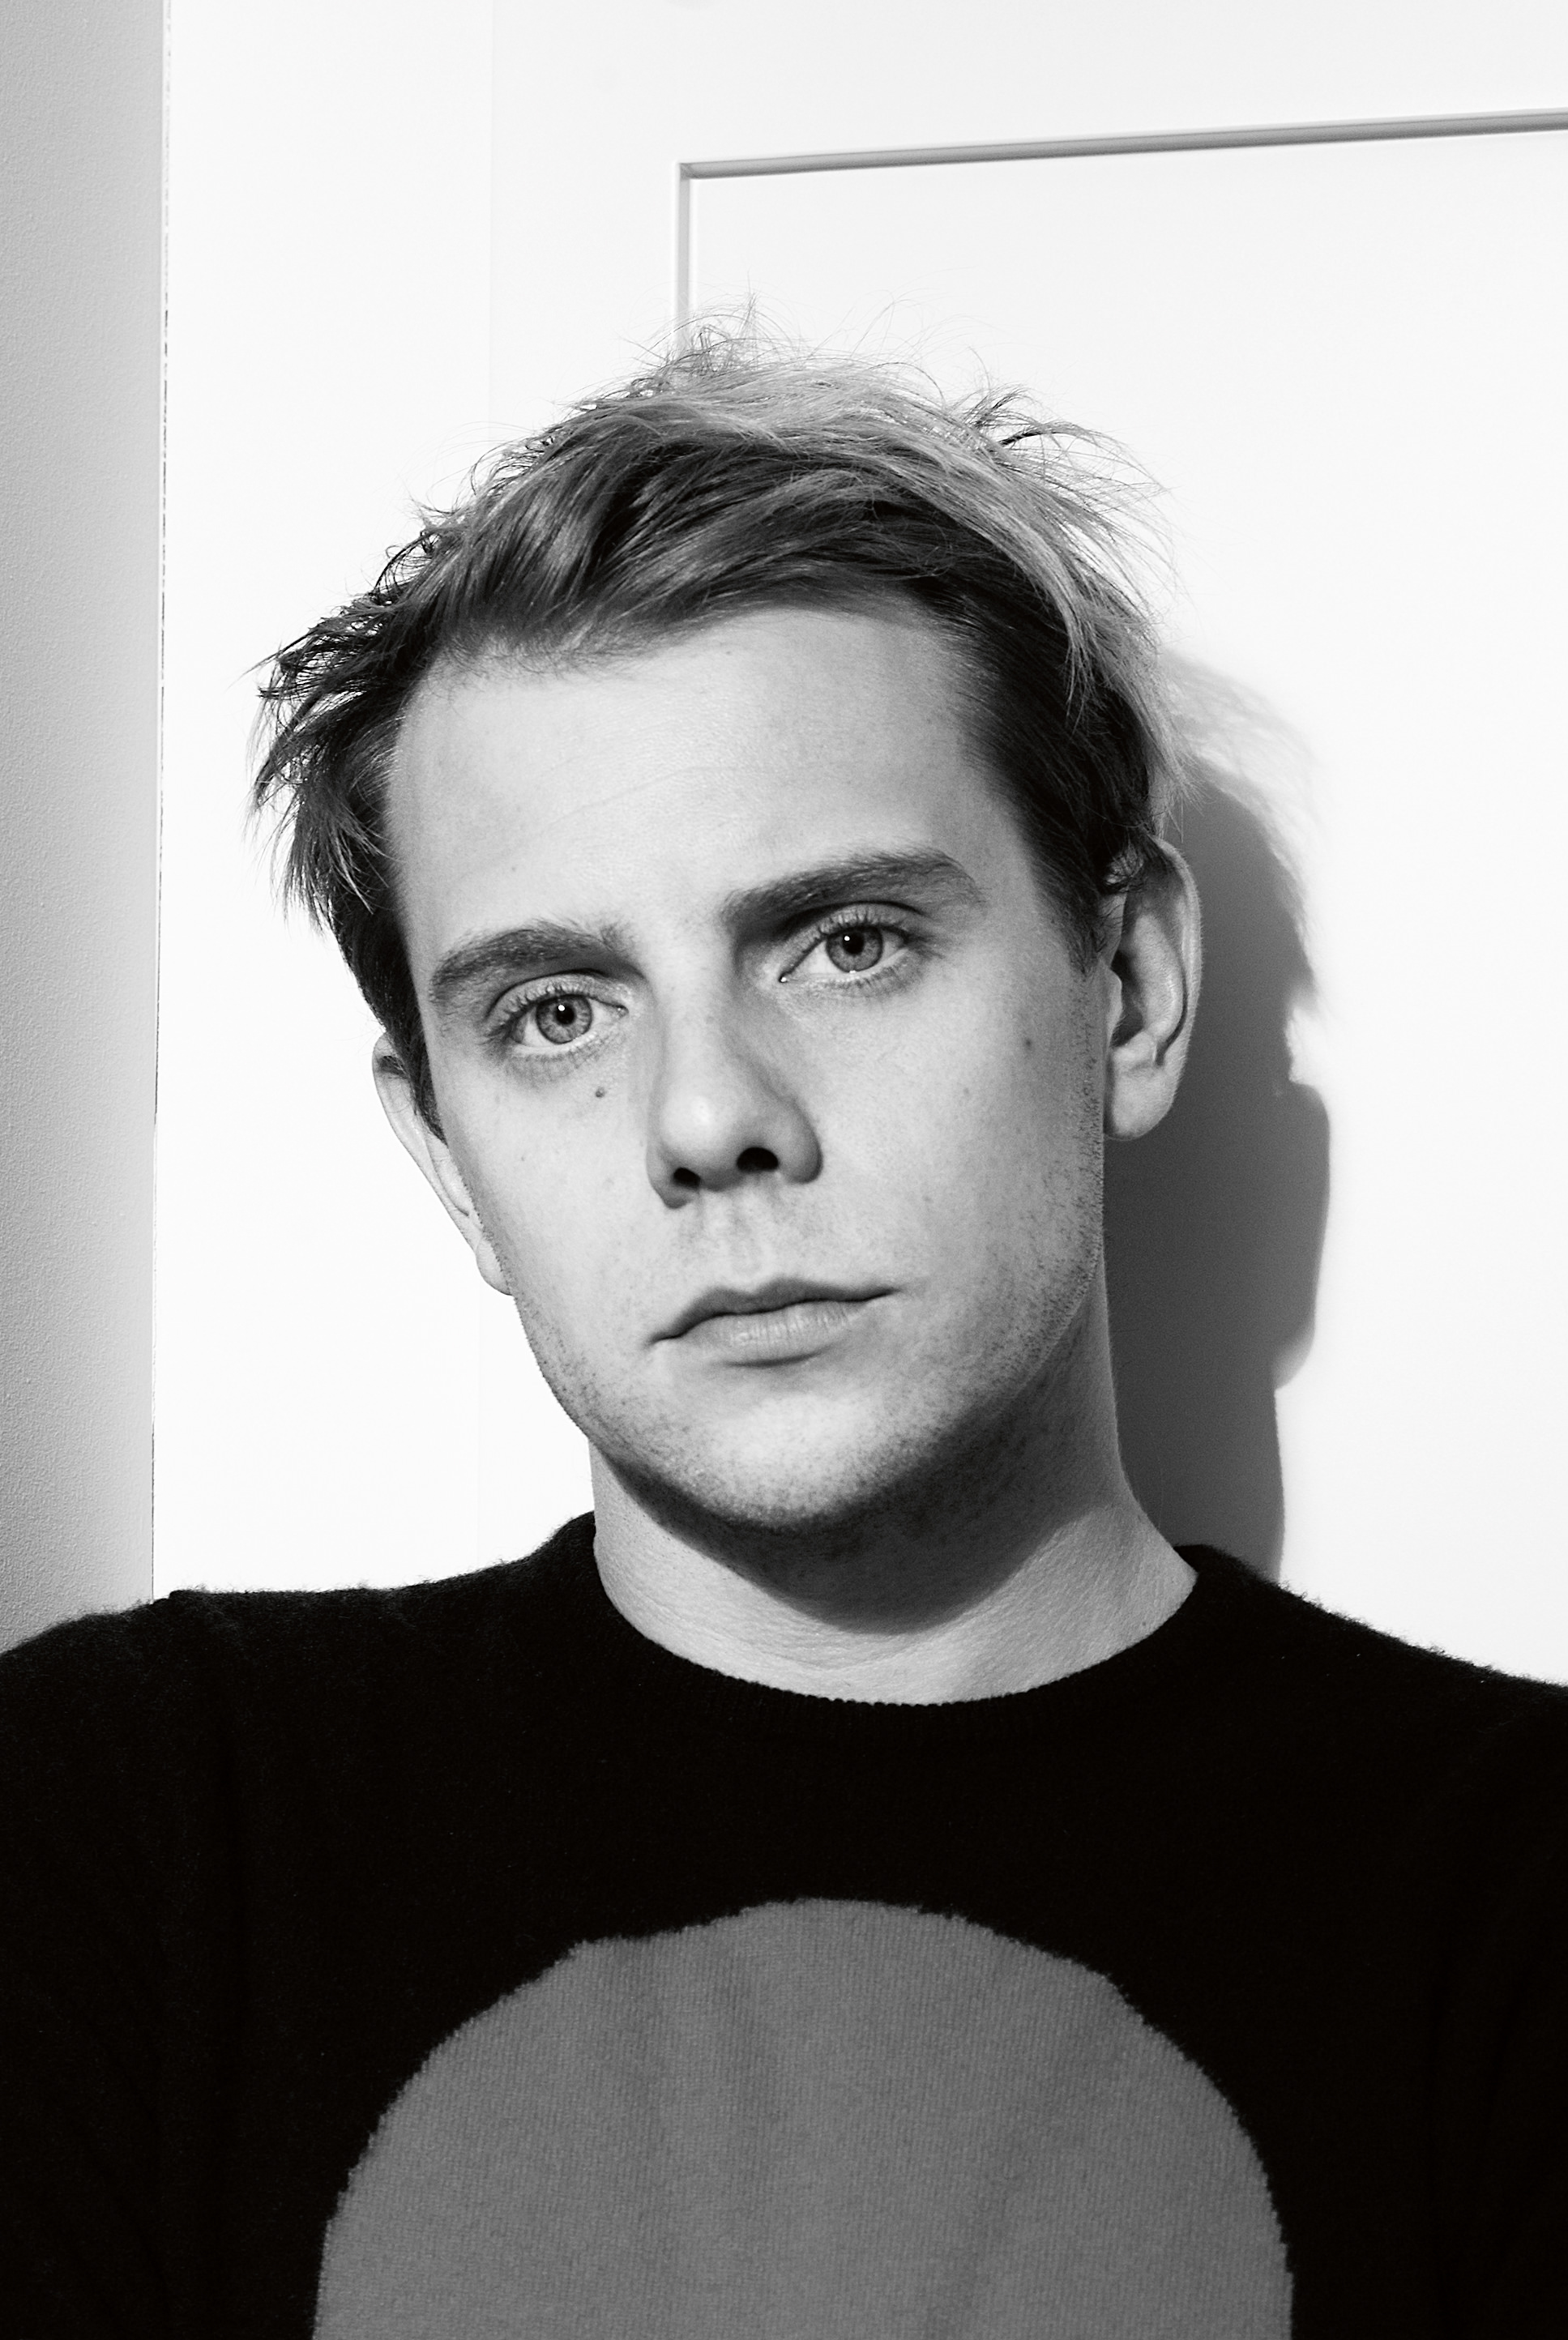 Jonathan Anderson, artistic director of Loewe